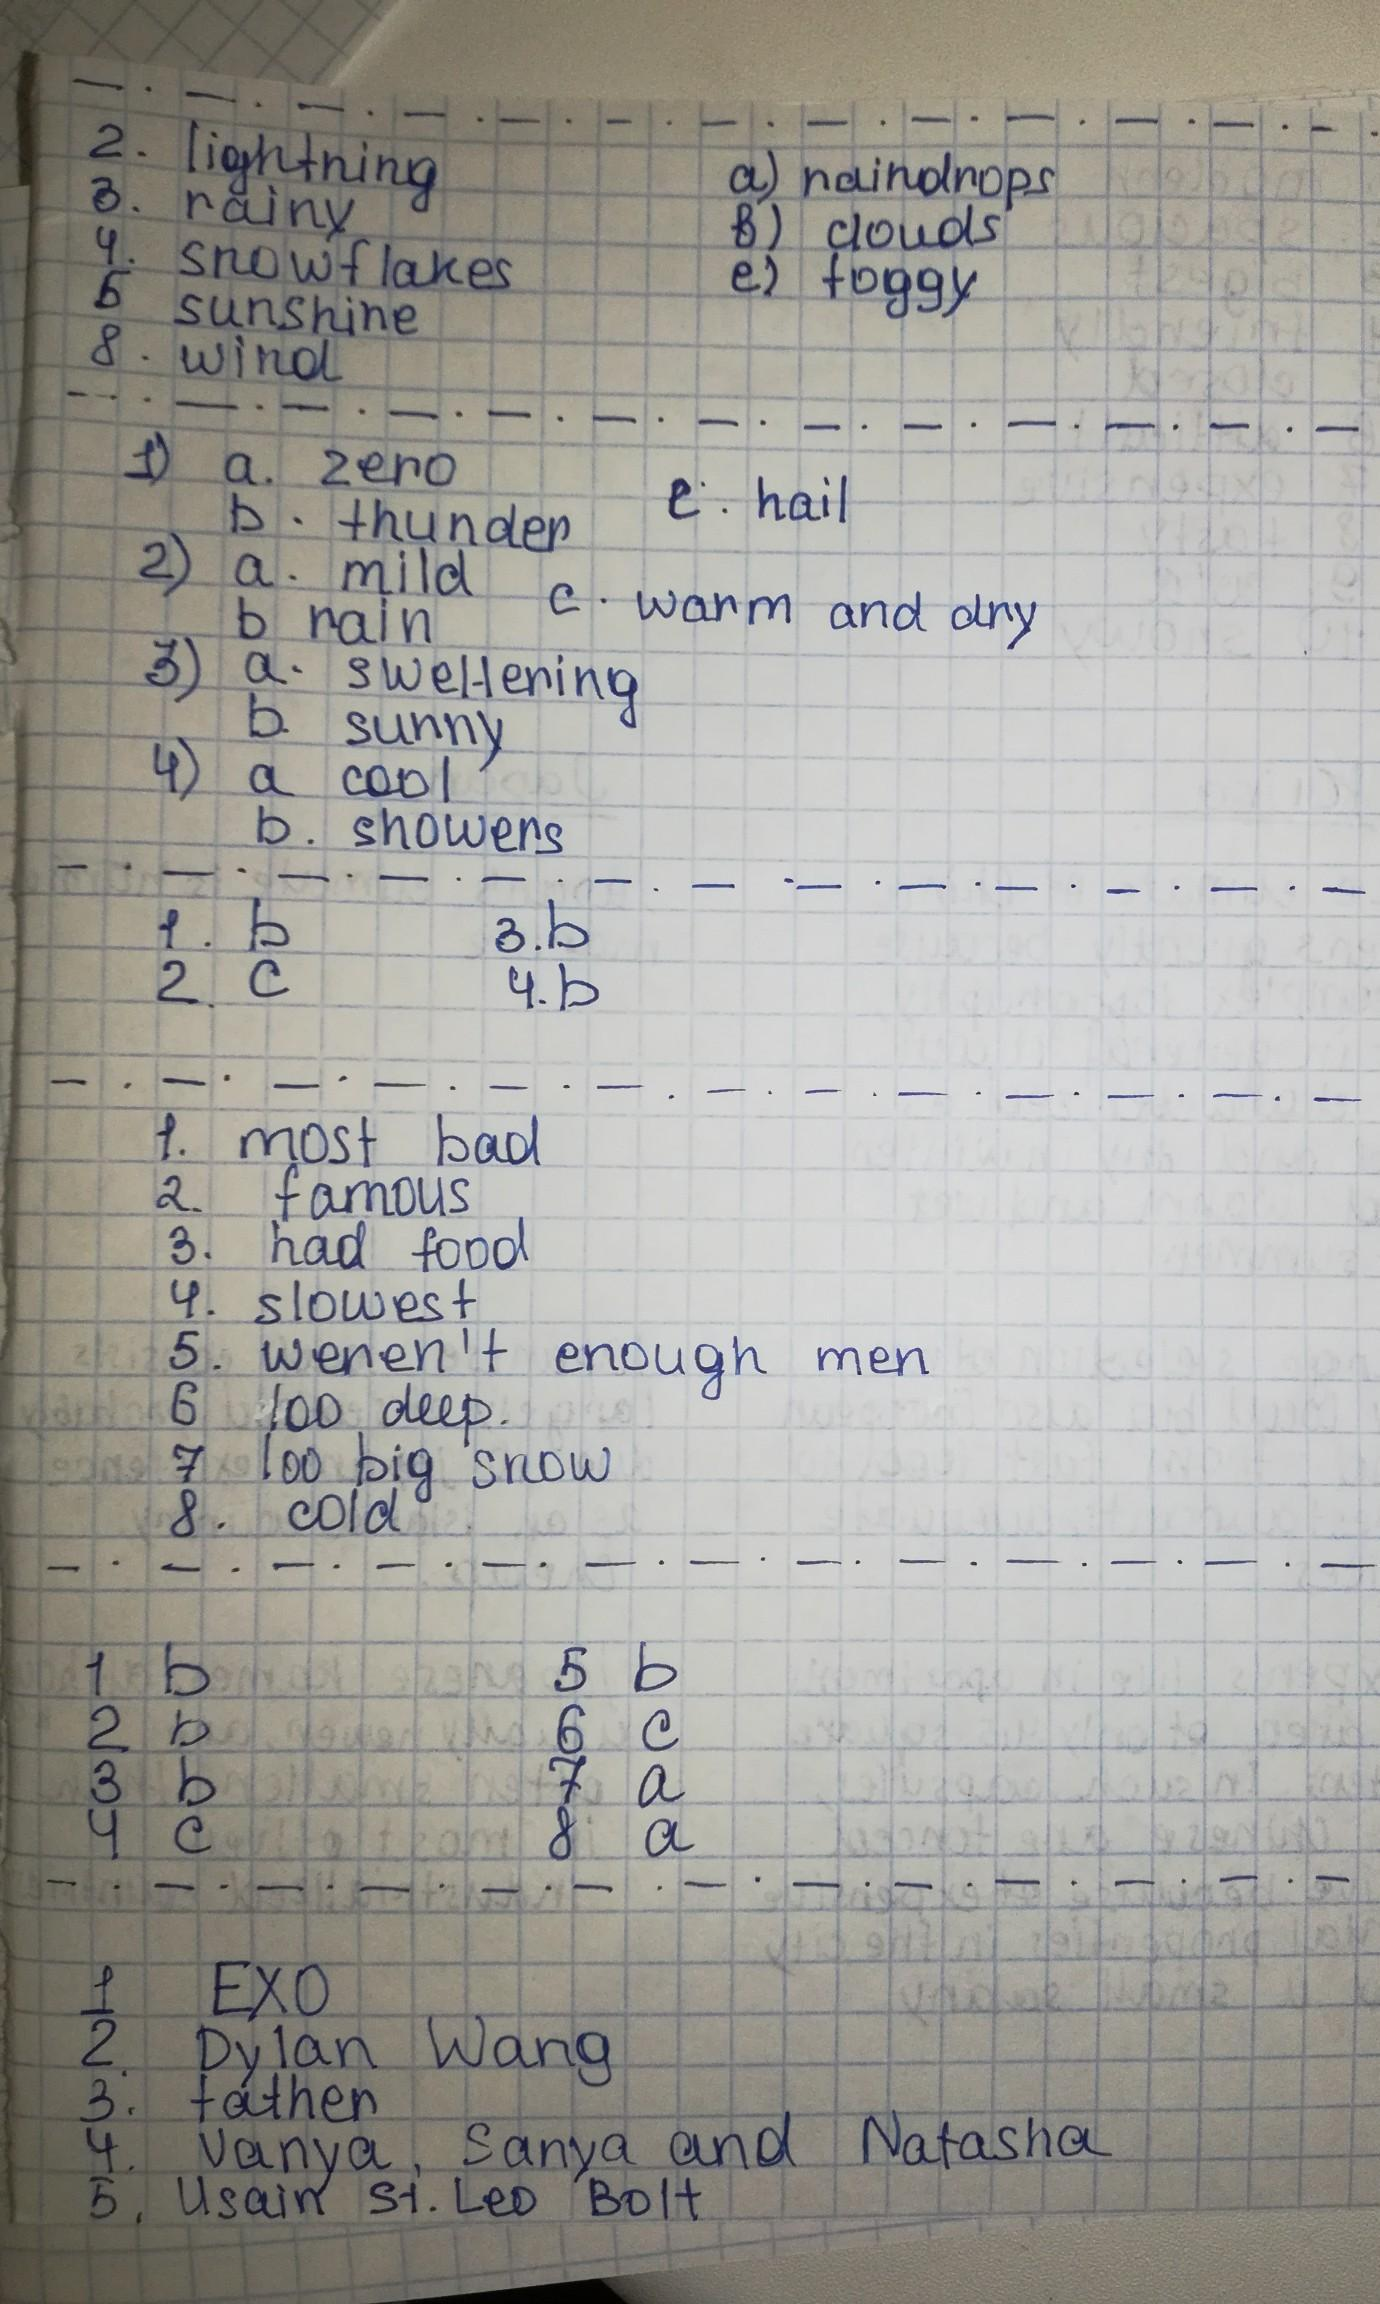 Умоляю помогите с английским!!!!!!!!!!!